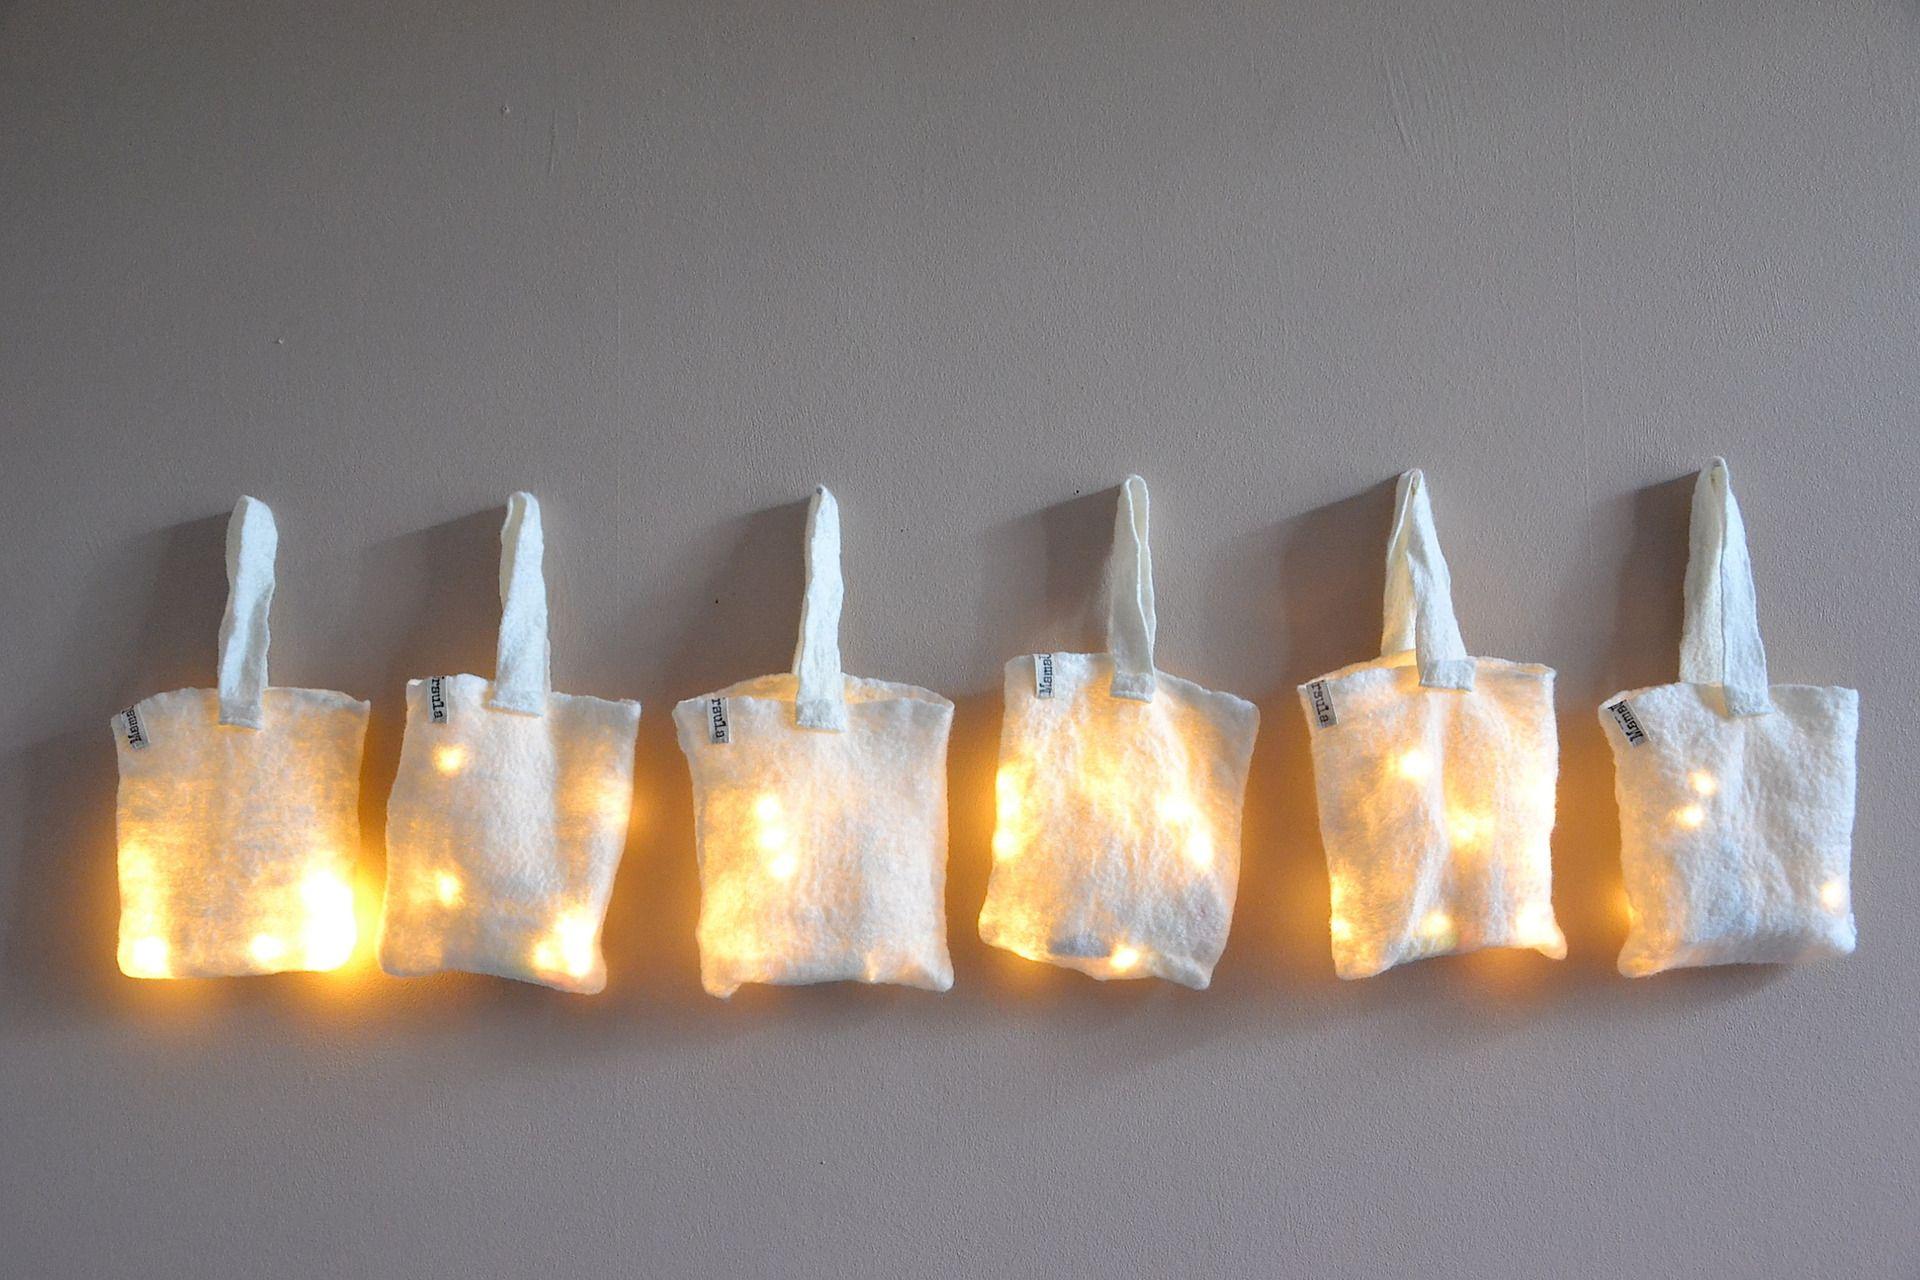 Lampe Veilleuse Guirlande Laine Feutrée Blanc Home Eco Design LED Lighting Bag : Luminaires par ursula